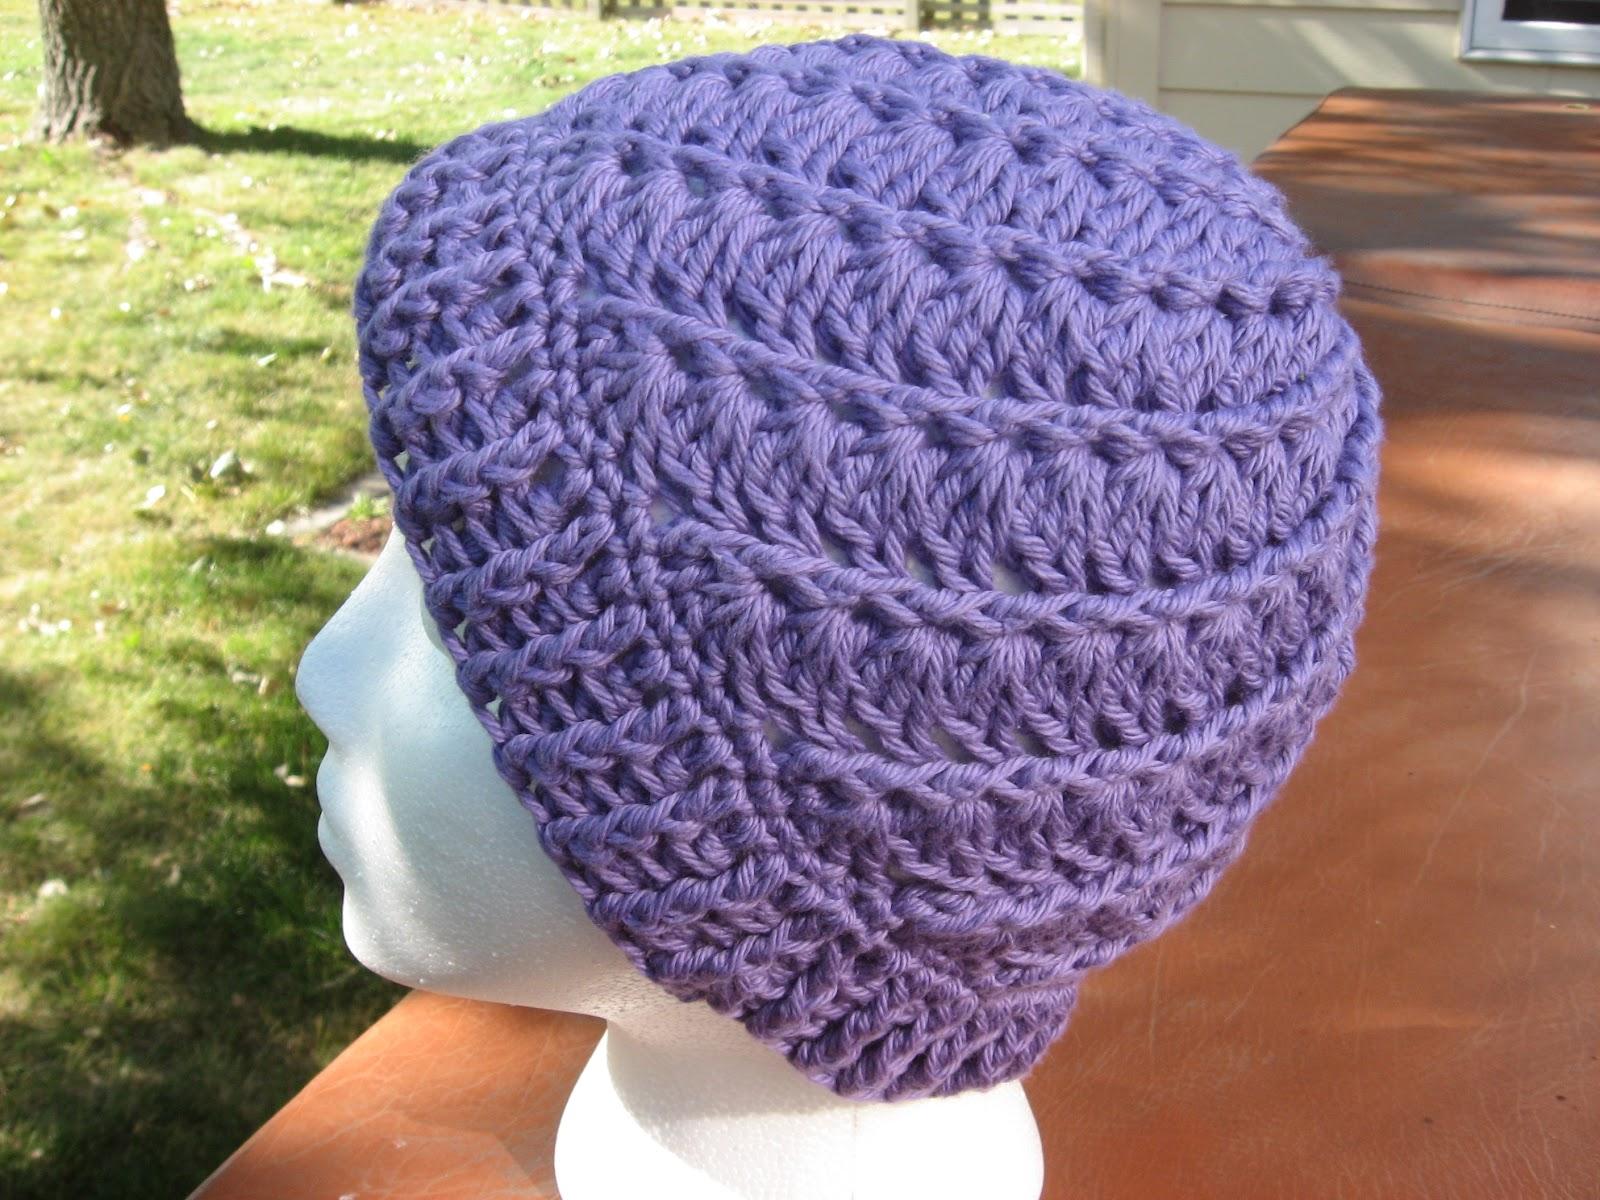 Crochet Projects  Chemo Hats Set  2 2c011f50f83